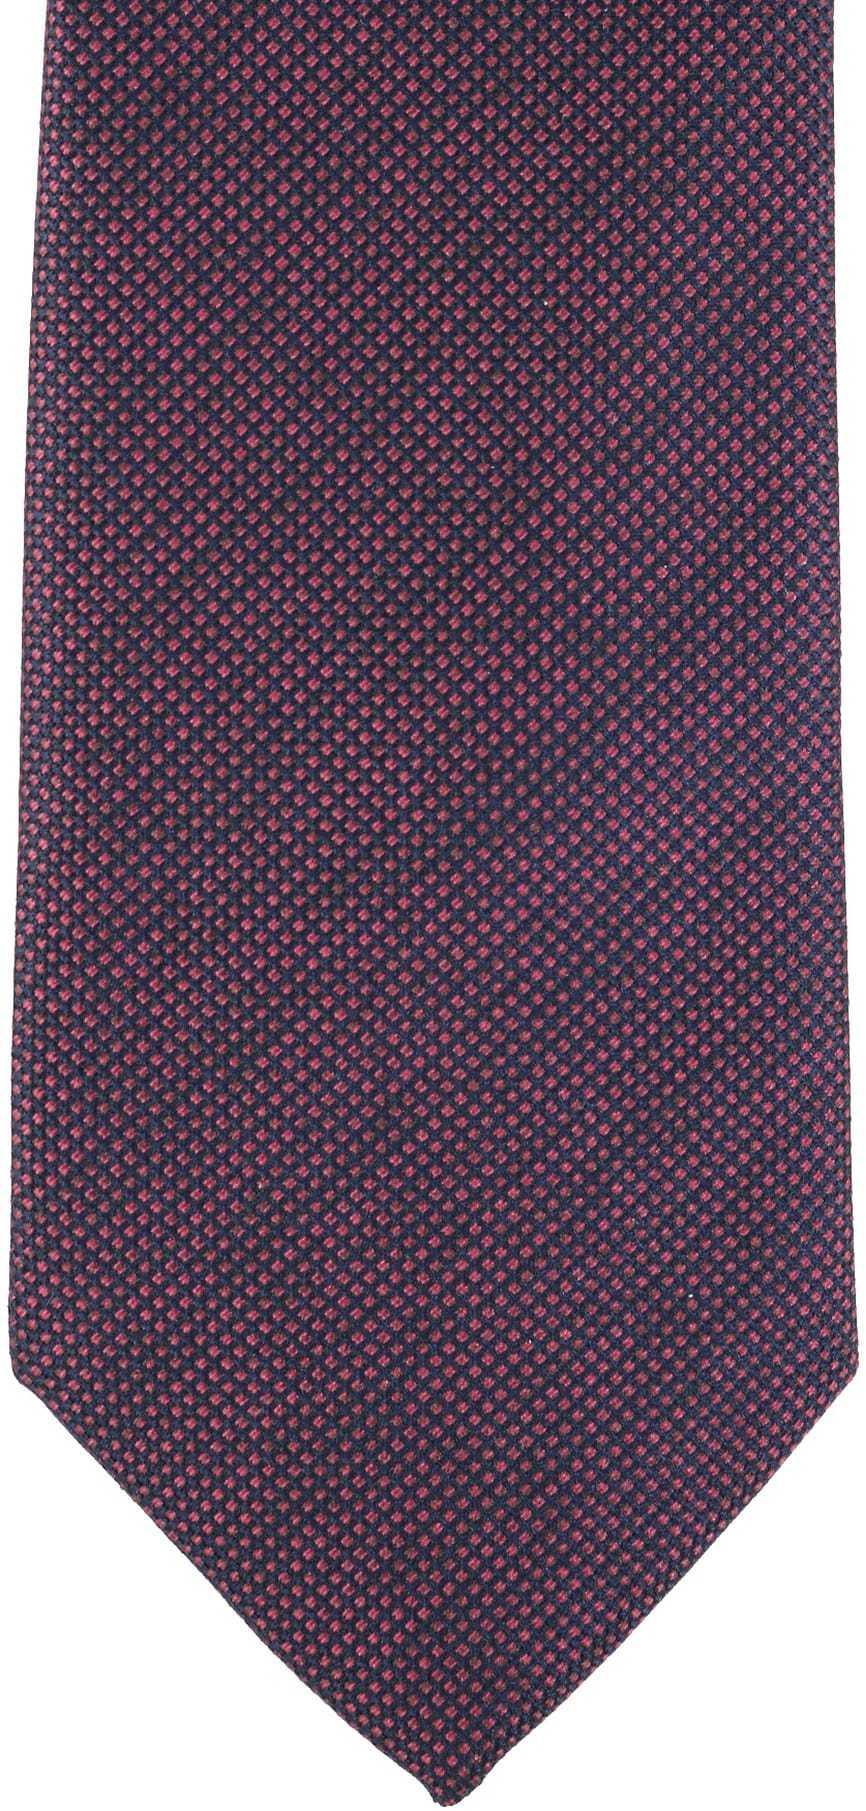 Krawatte Seide Pinpoint Bordeaux 9-17 foto 1